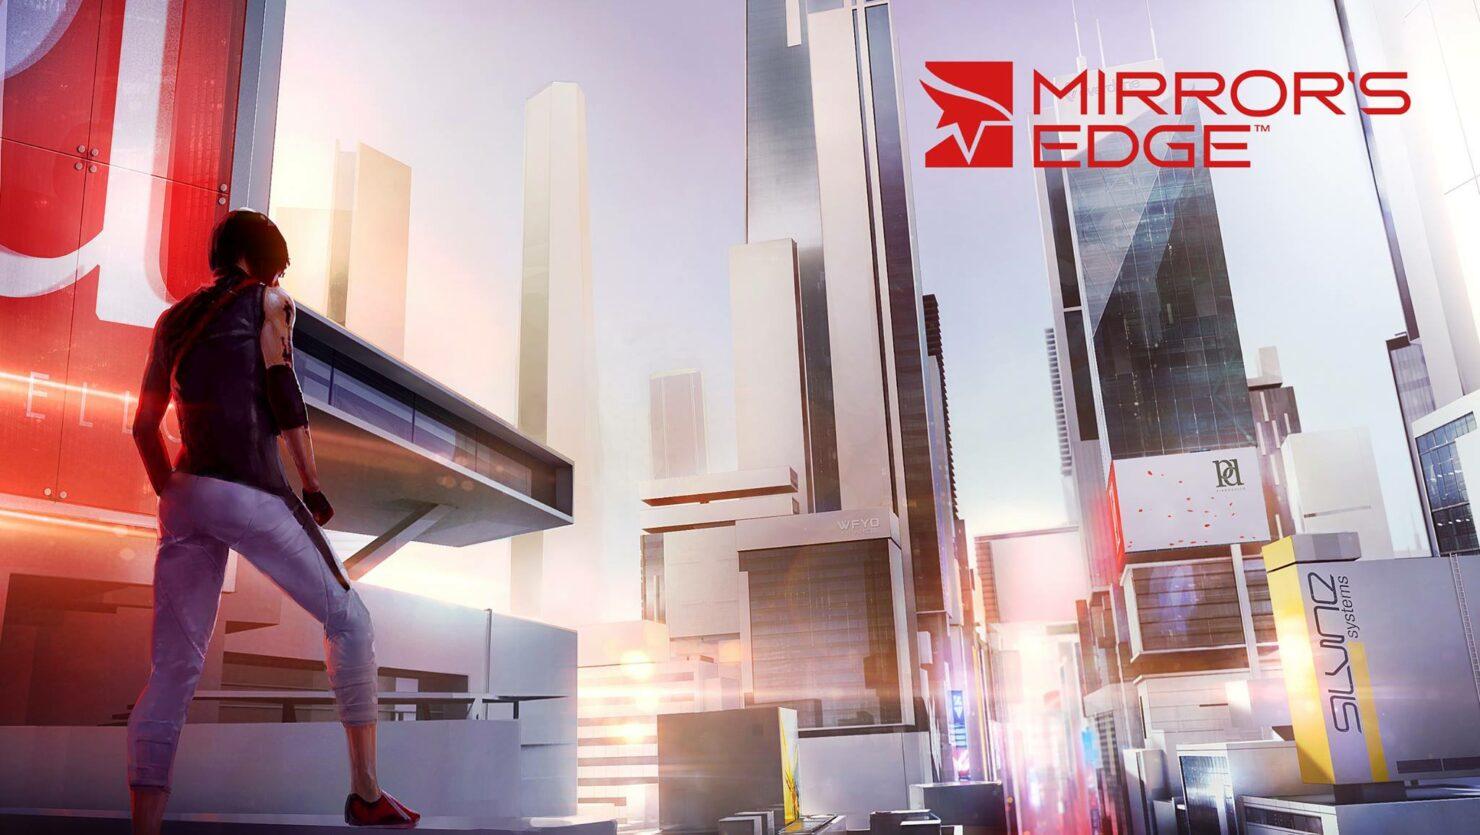 mirrors-edge-2014